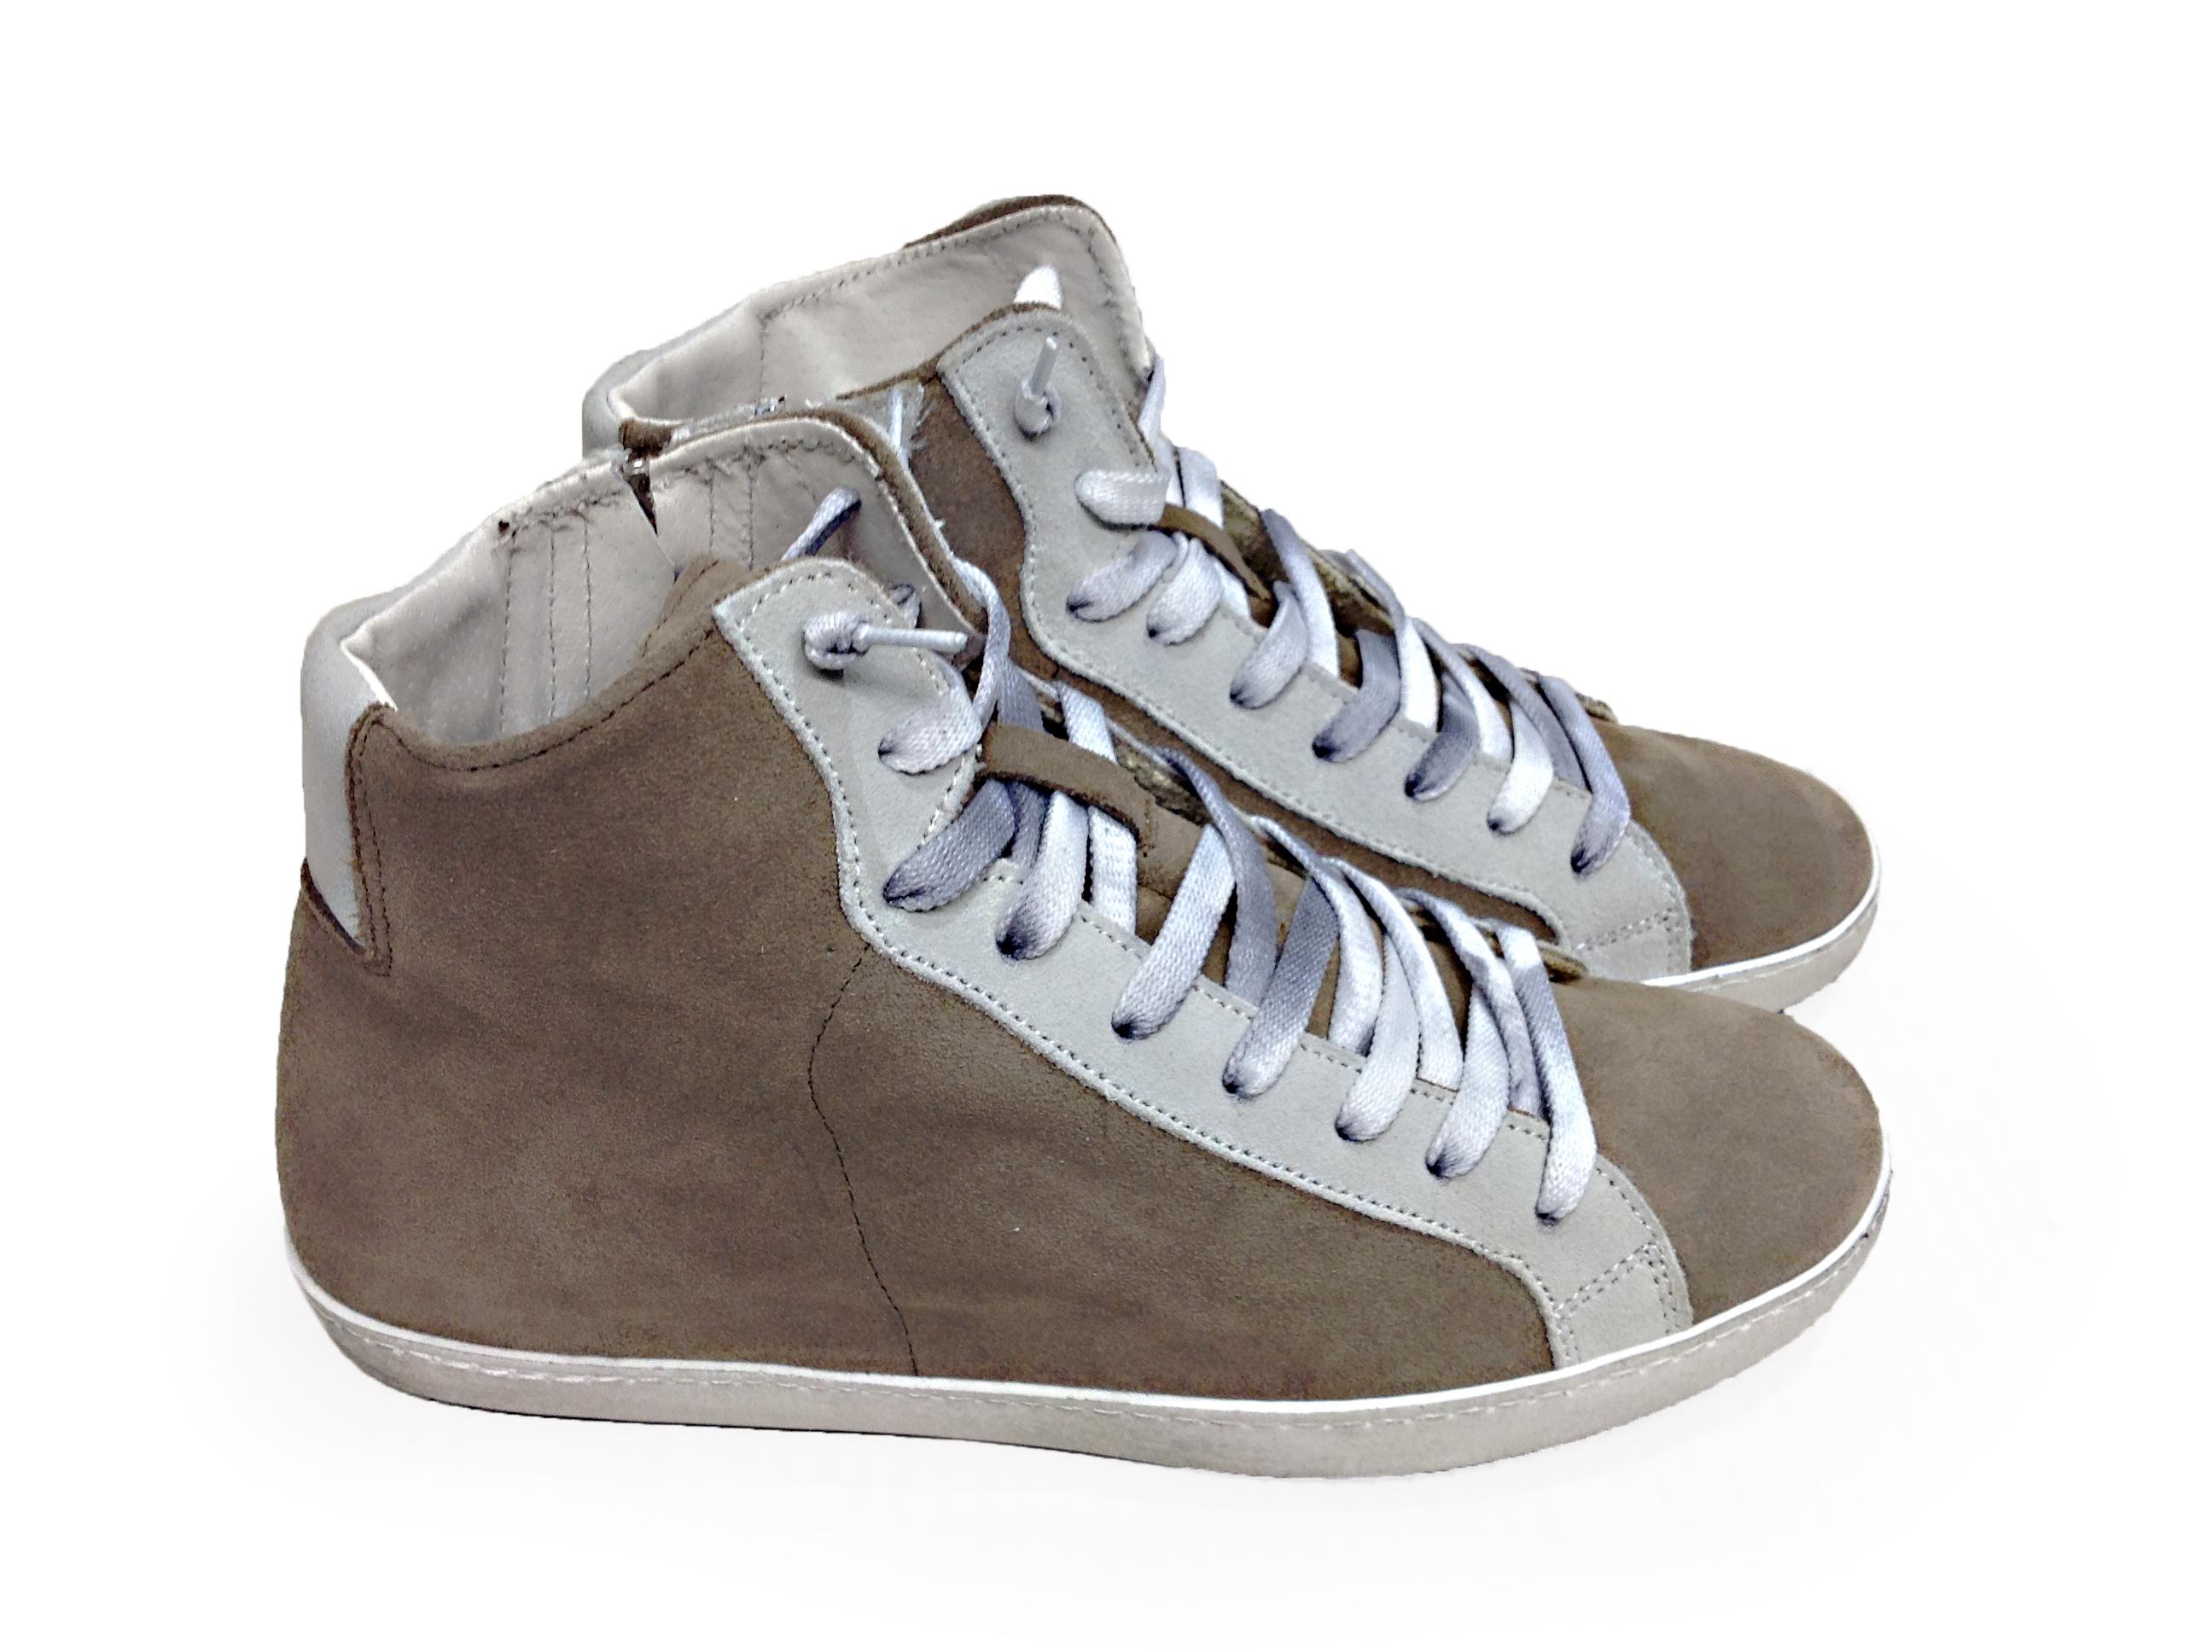 Scarpe Lezshoes Scamosciate Via Sneakers Alte Uomo Yf7gb6yv